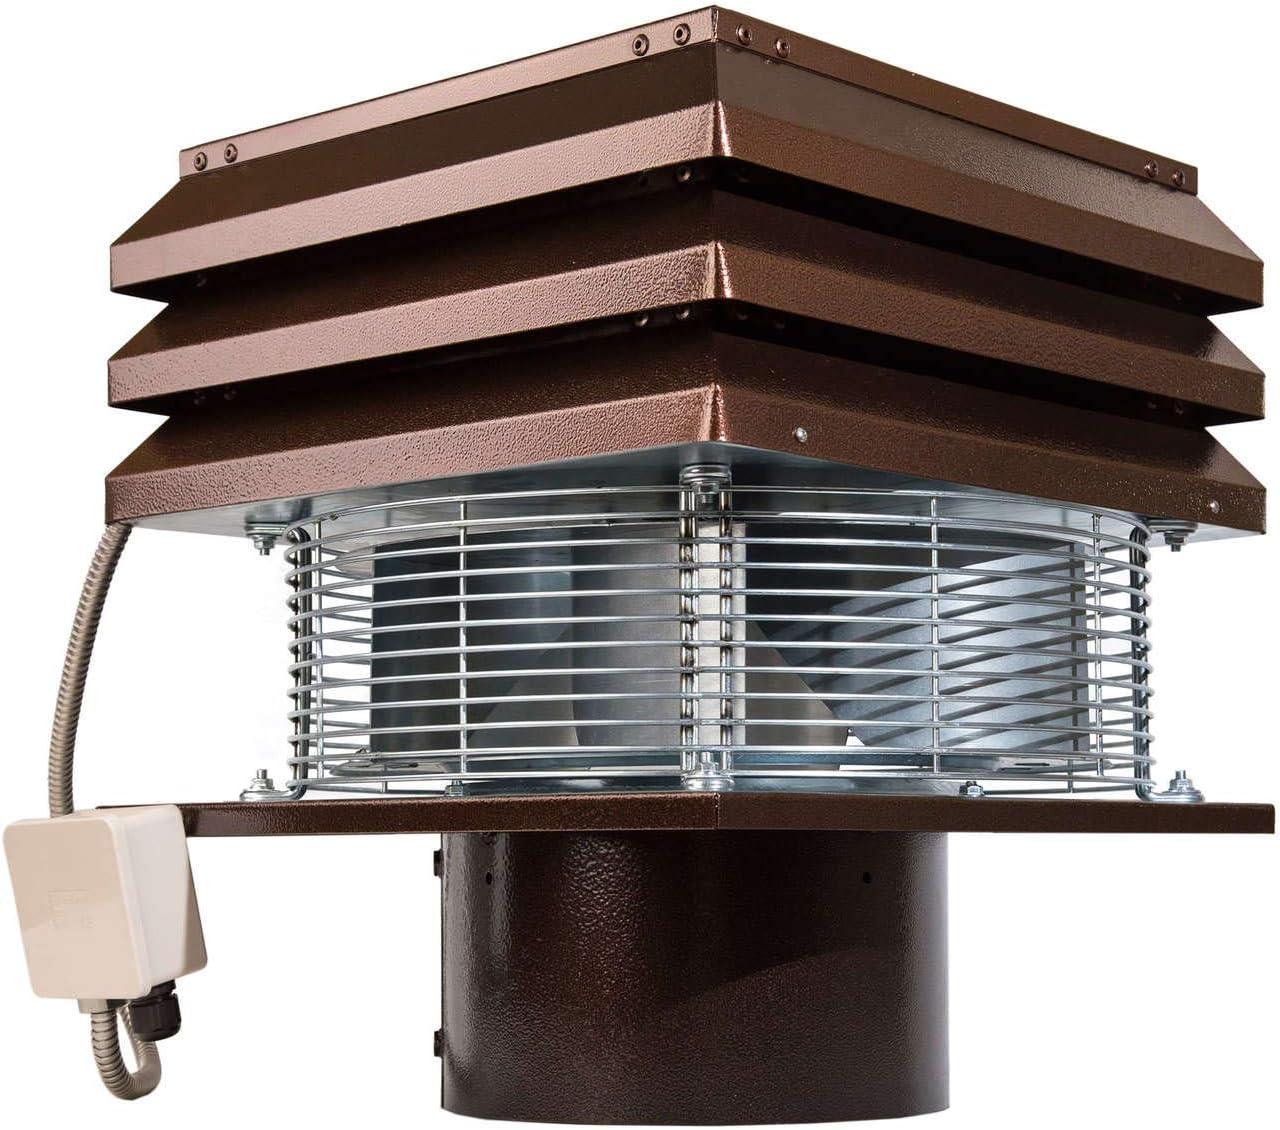 Extractor de humo Extractores de humo para chimeneas para barbacoa Aspirador de humos para chimenea extractor de chimenea extractor chimenea leña Gemi Elettronica modelo profesional redondo de 25 cm